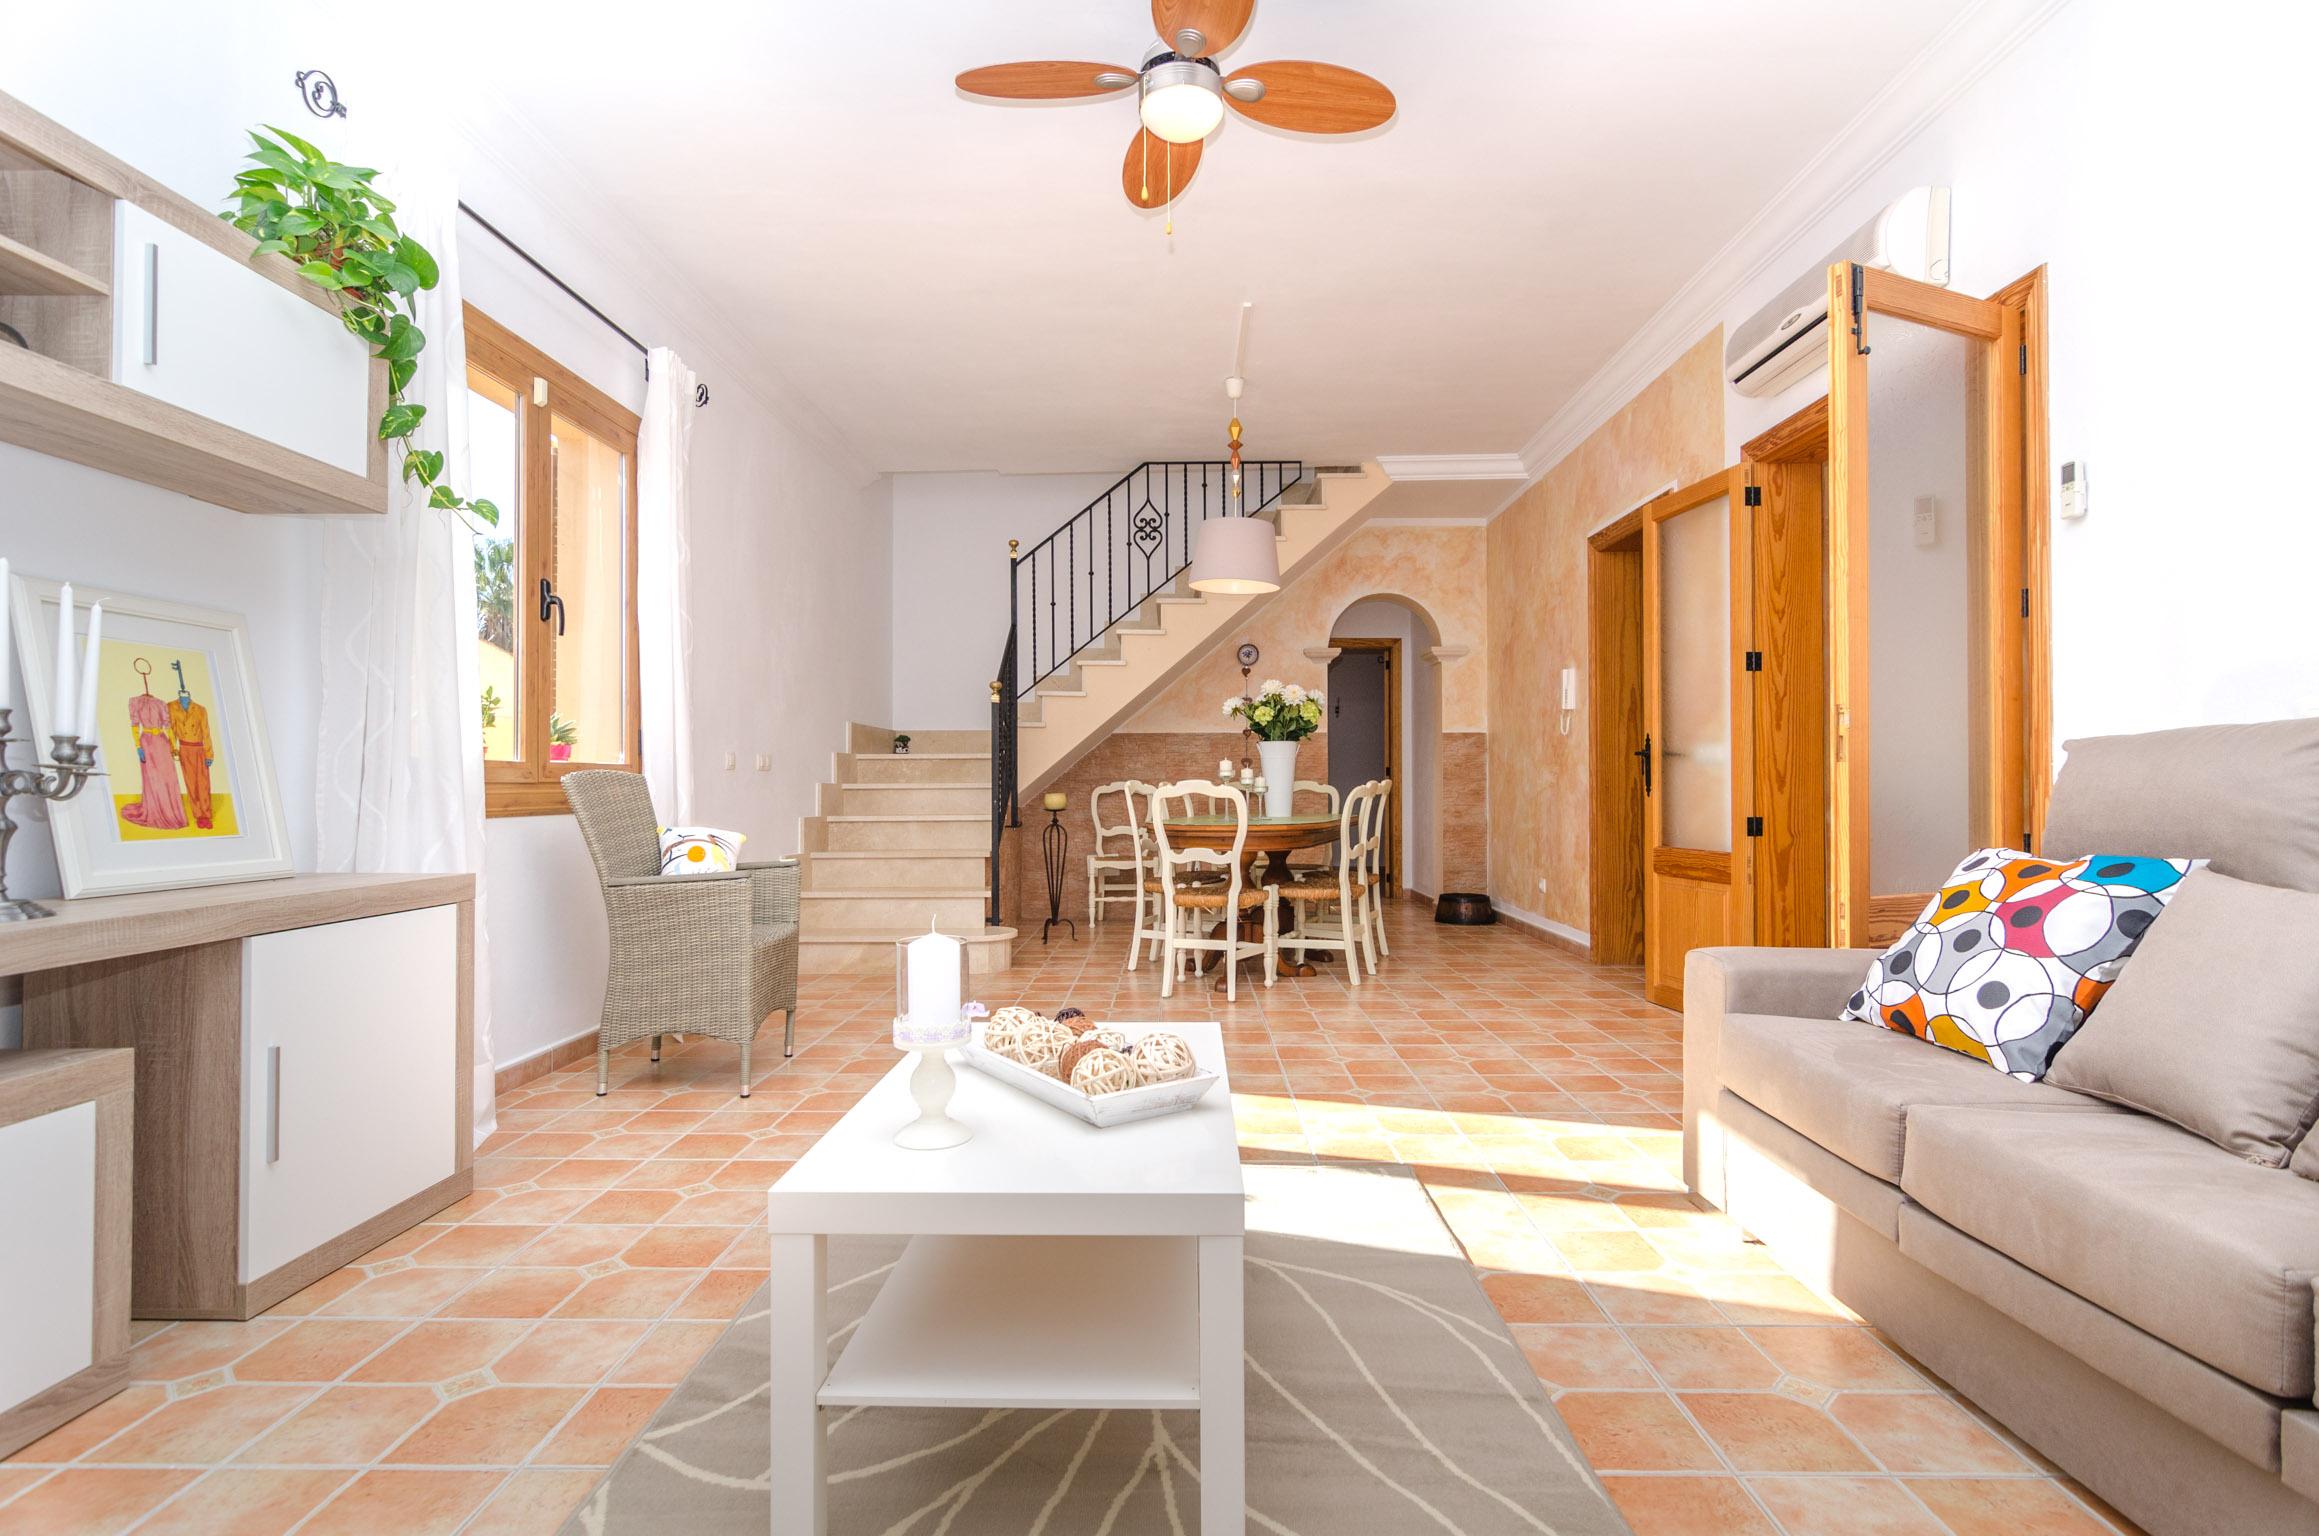 Ferienhaus SANT BLAI VELL (2284789), Campos, Mallorca, Balearische Inseln, Spanien, Bild 12